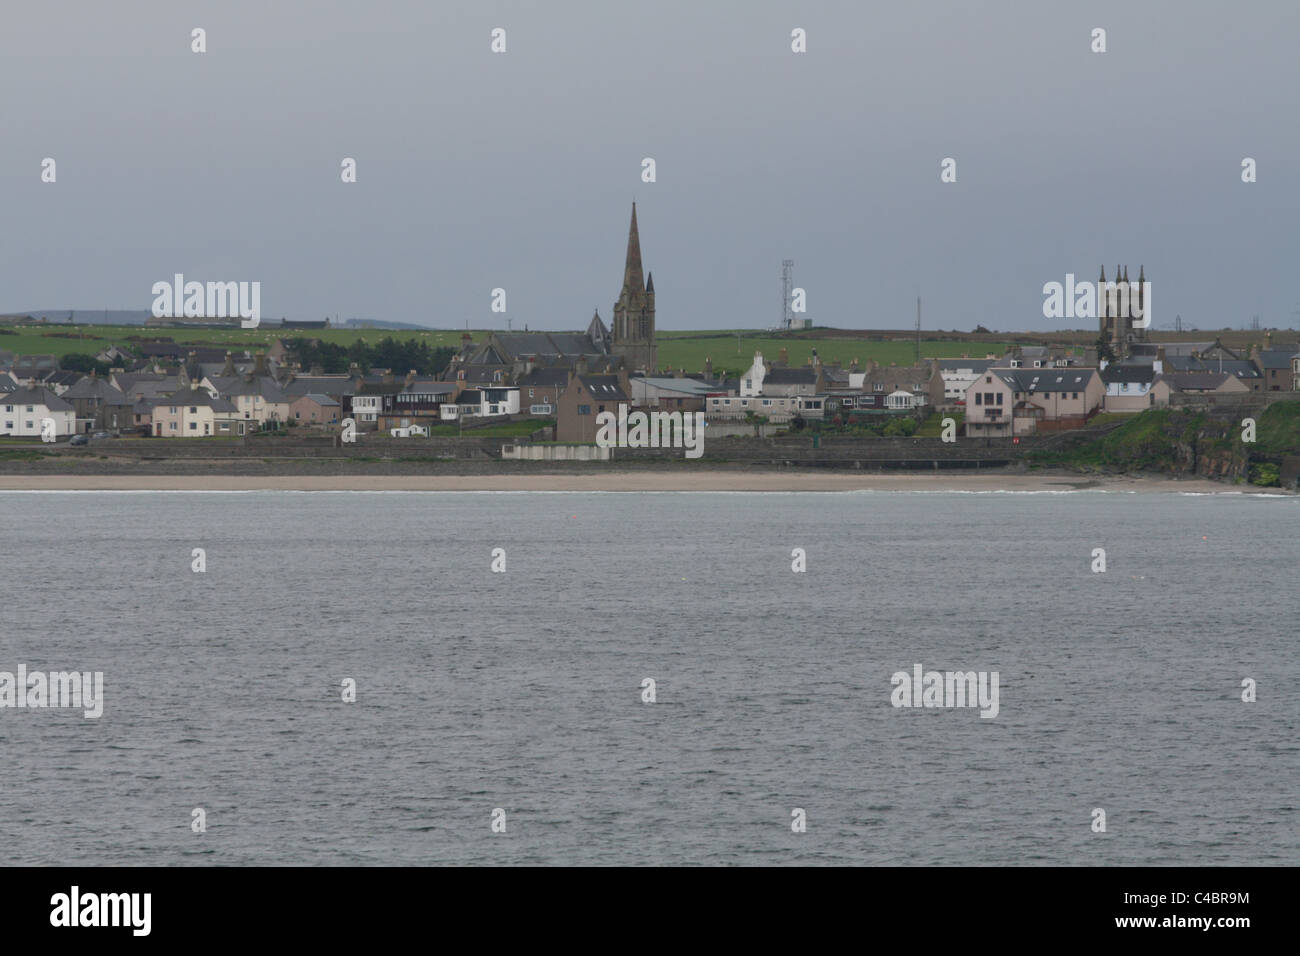 Thurso waterfront Caithness Scotland May 2011 - Stock Image